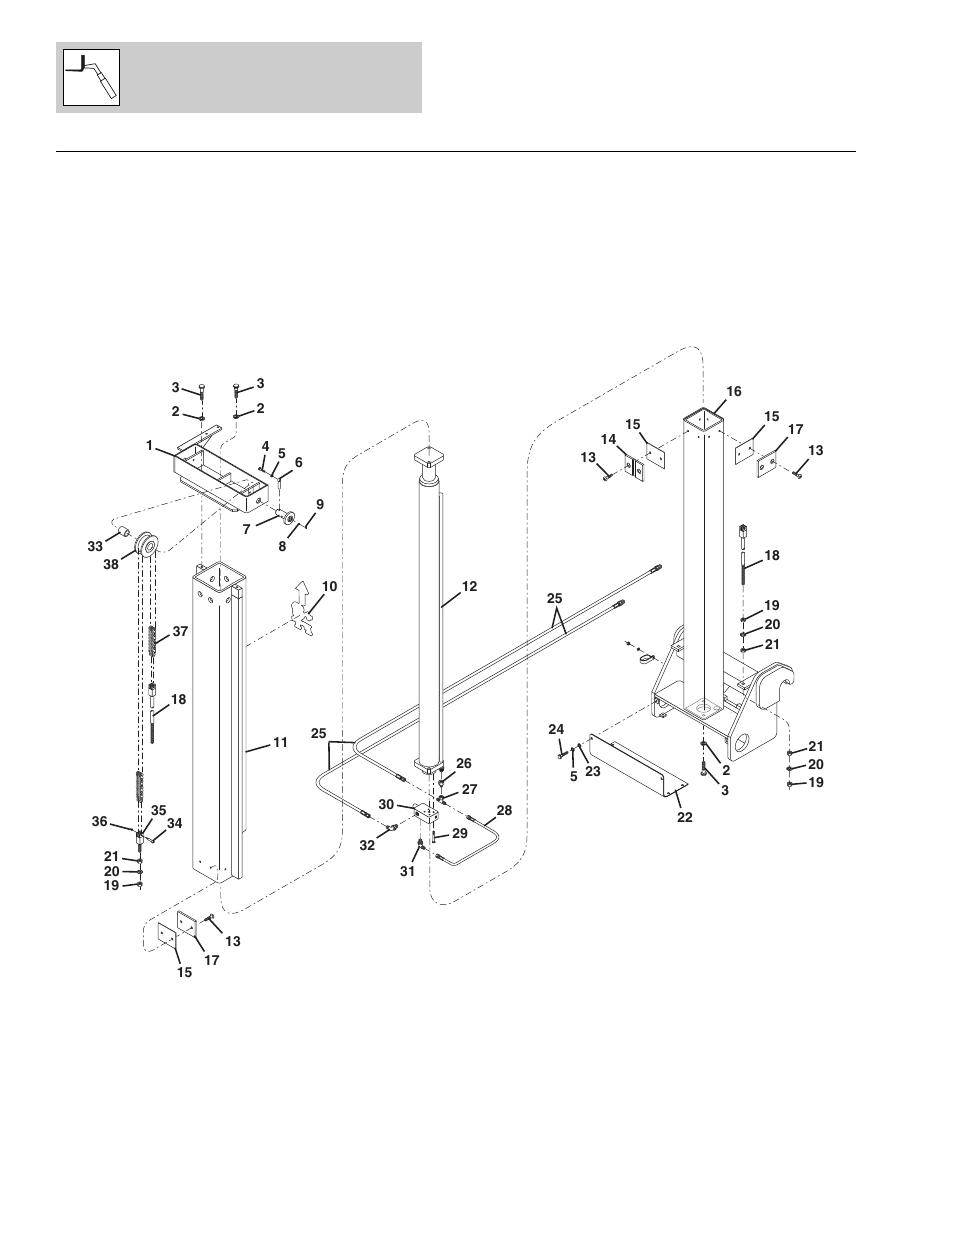 Figure 3-11 8 ft vertical mast assembly, 8 ft vertical